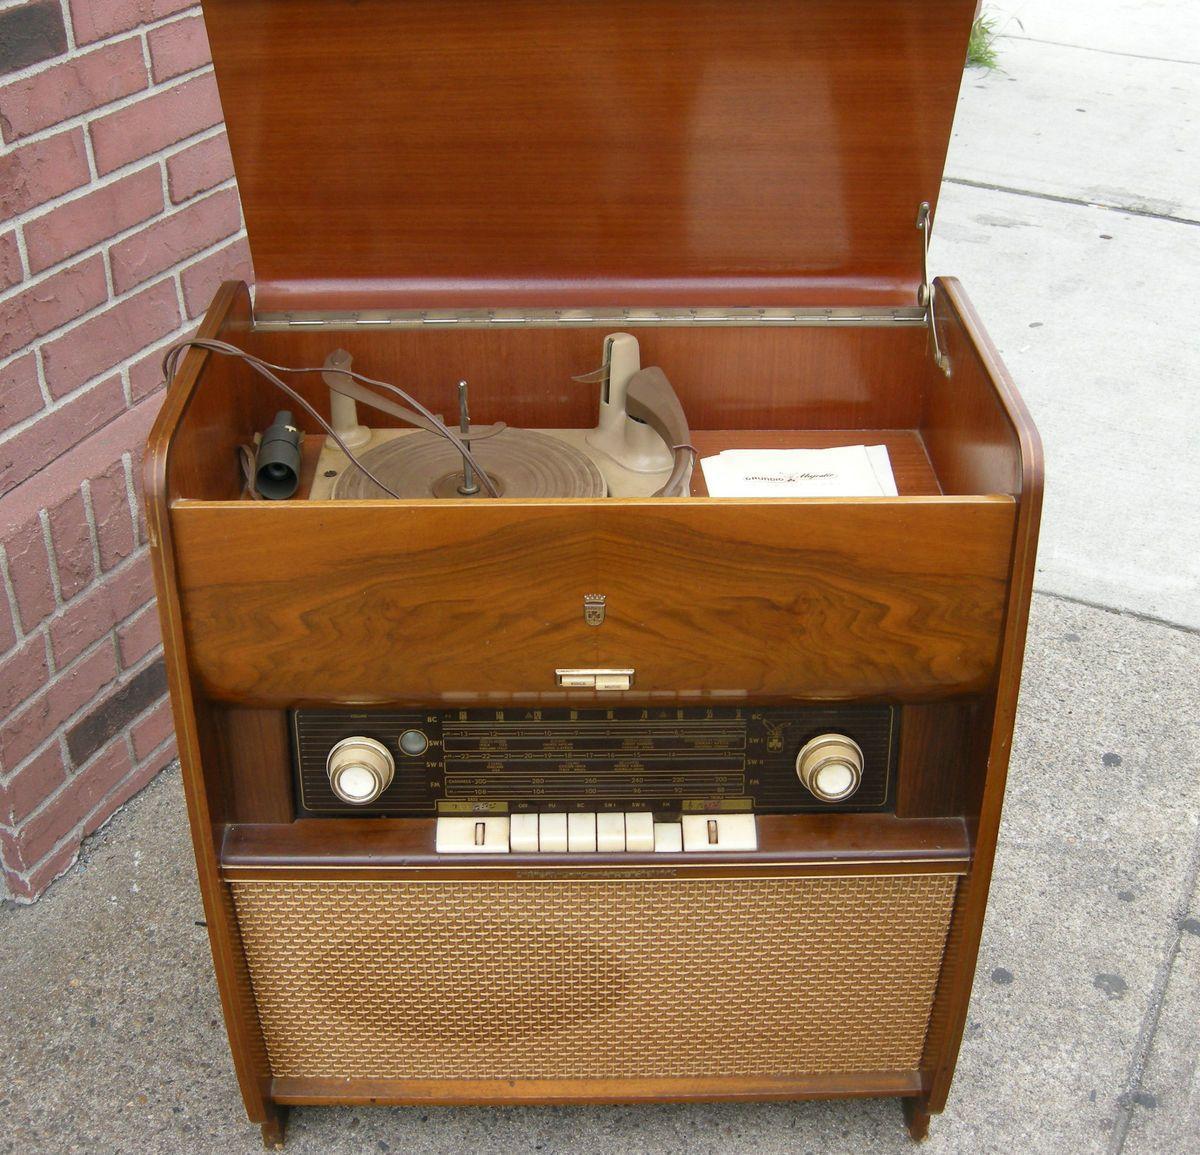 Vintage Grundig Majestic 7000 Stereo Console Phonograph Tube Radio w